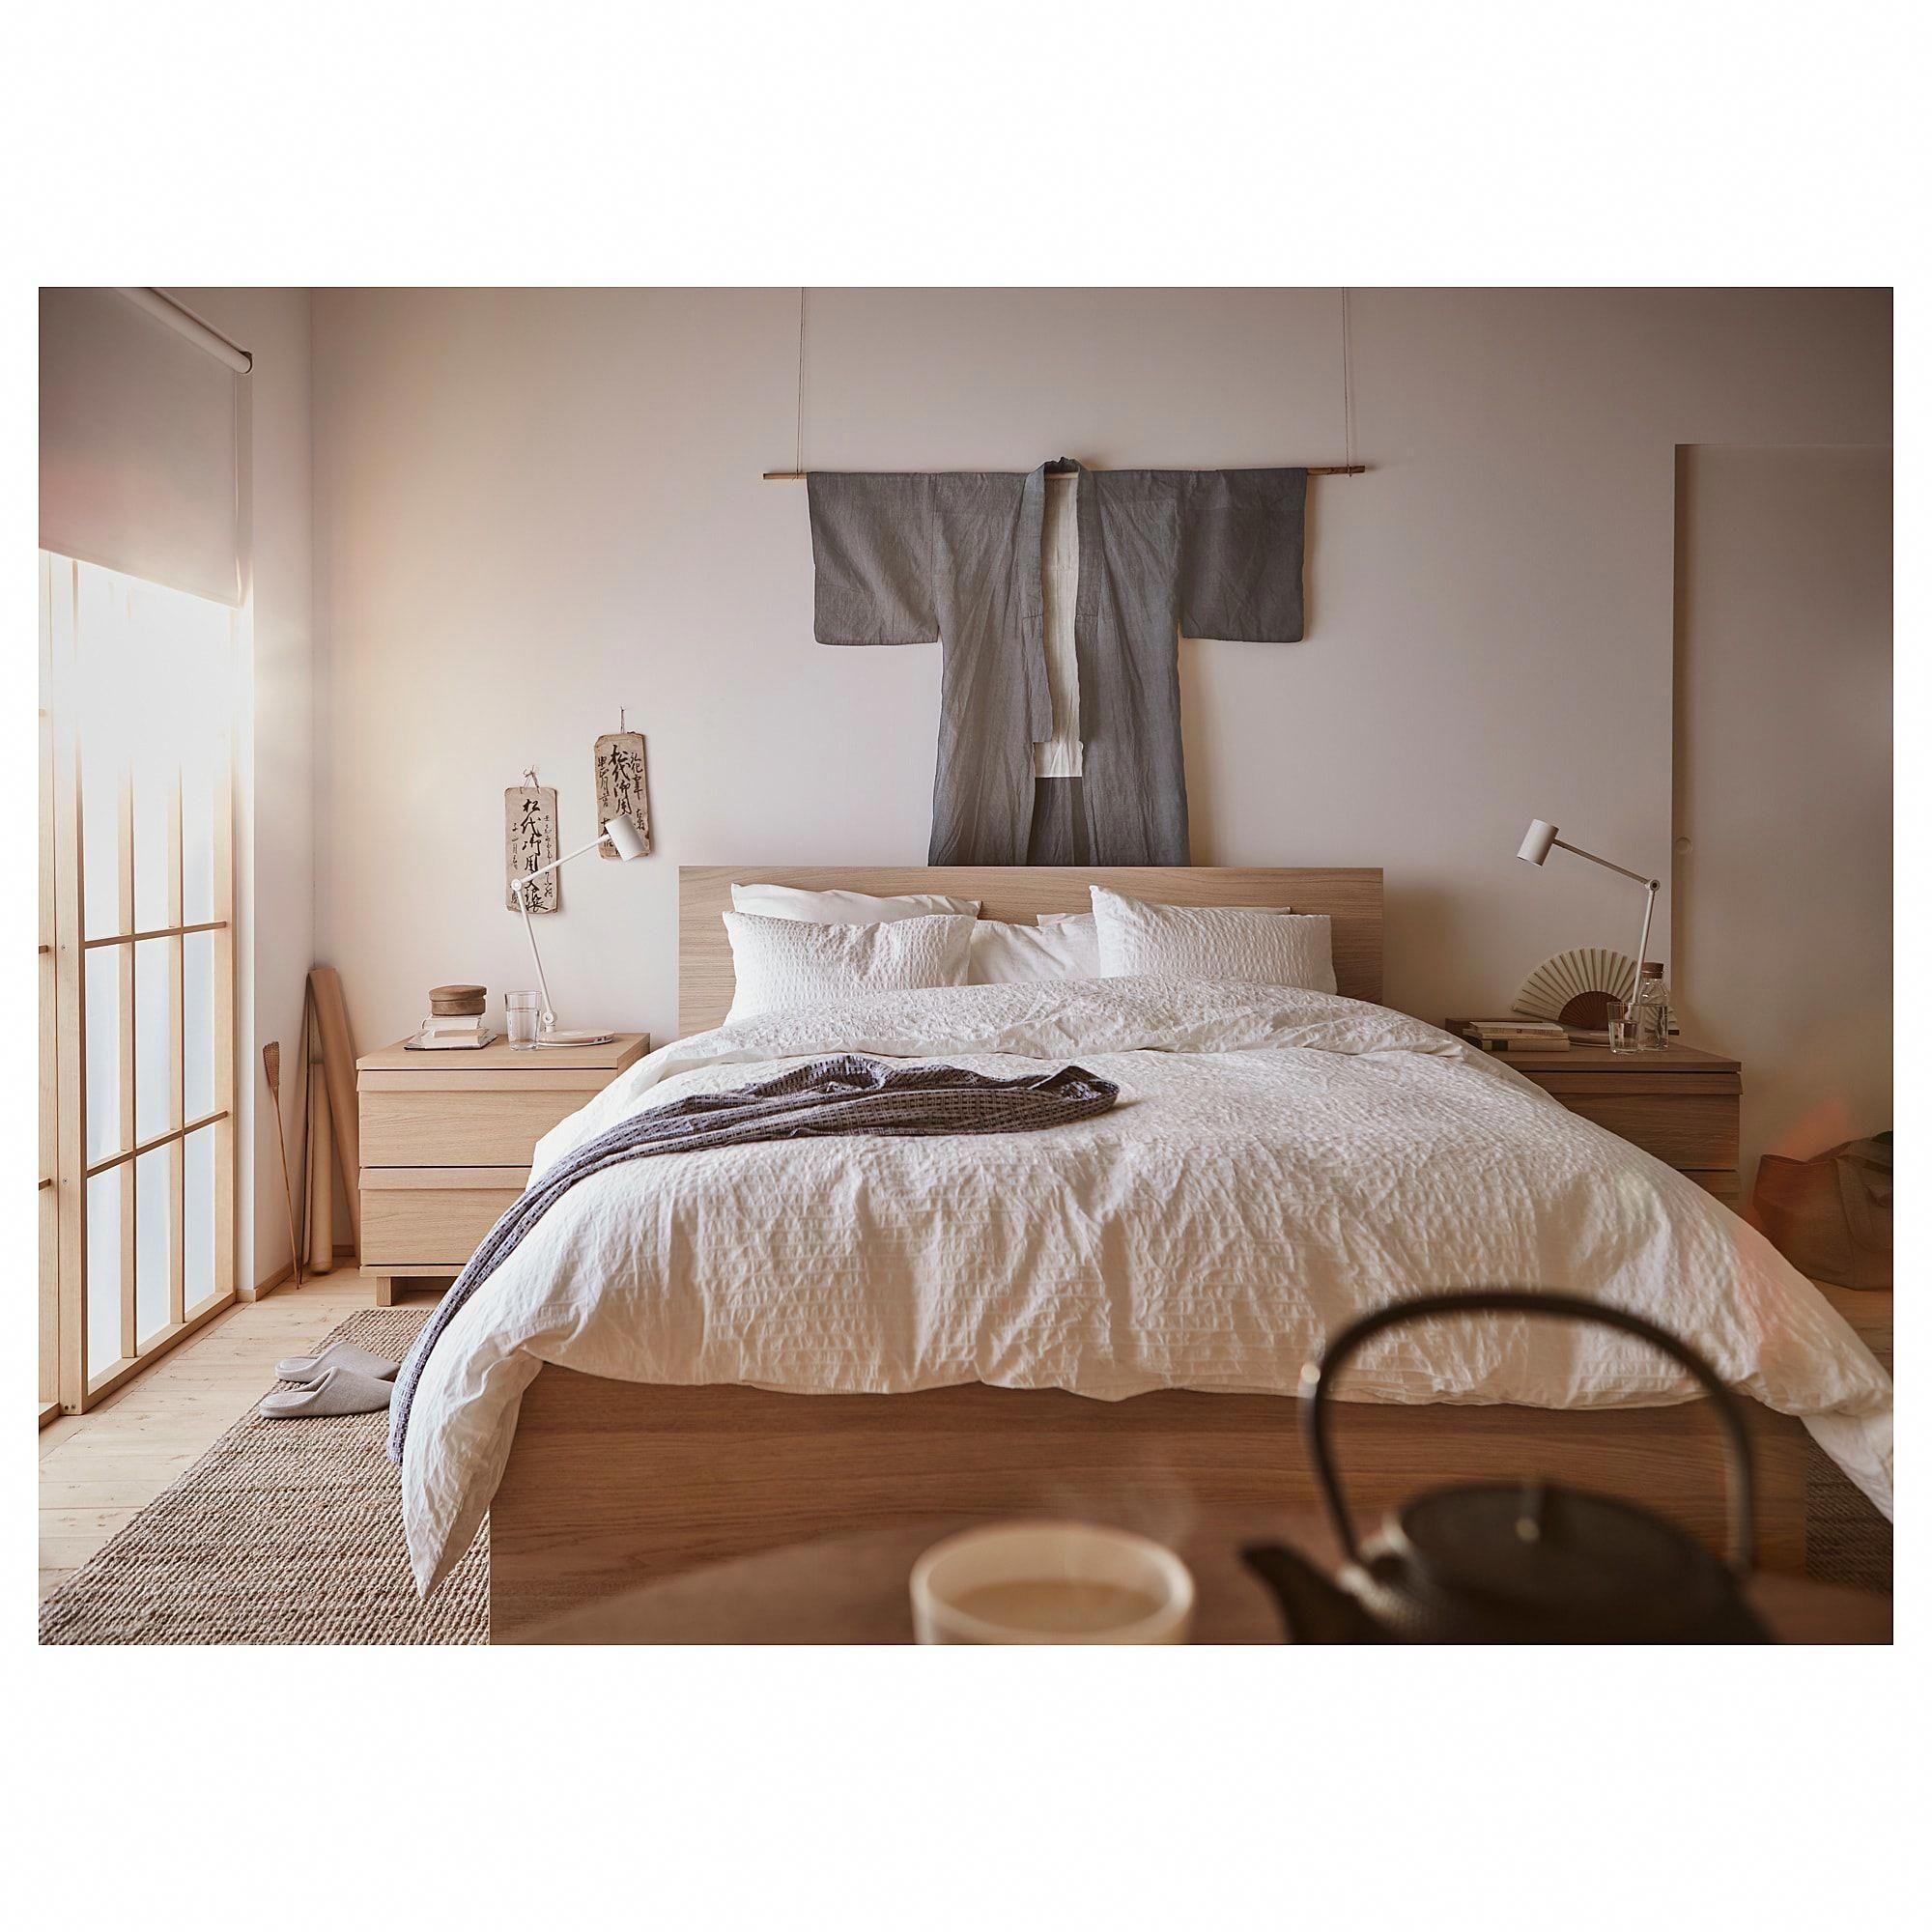 Ikea Us Furniture And Home Furnishings Malm Bed Frame Ikea Malm Bed Malm Bed